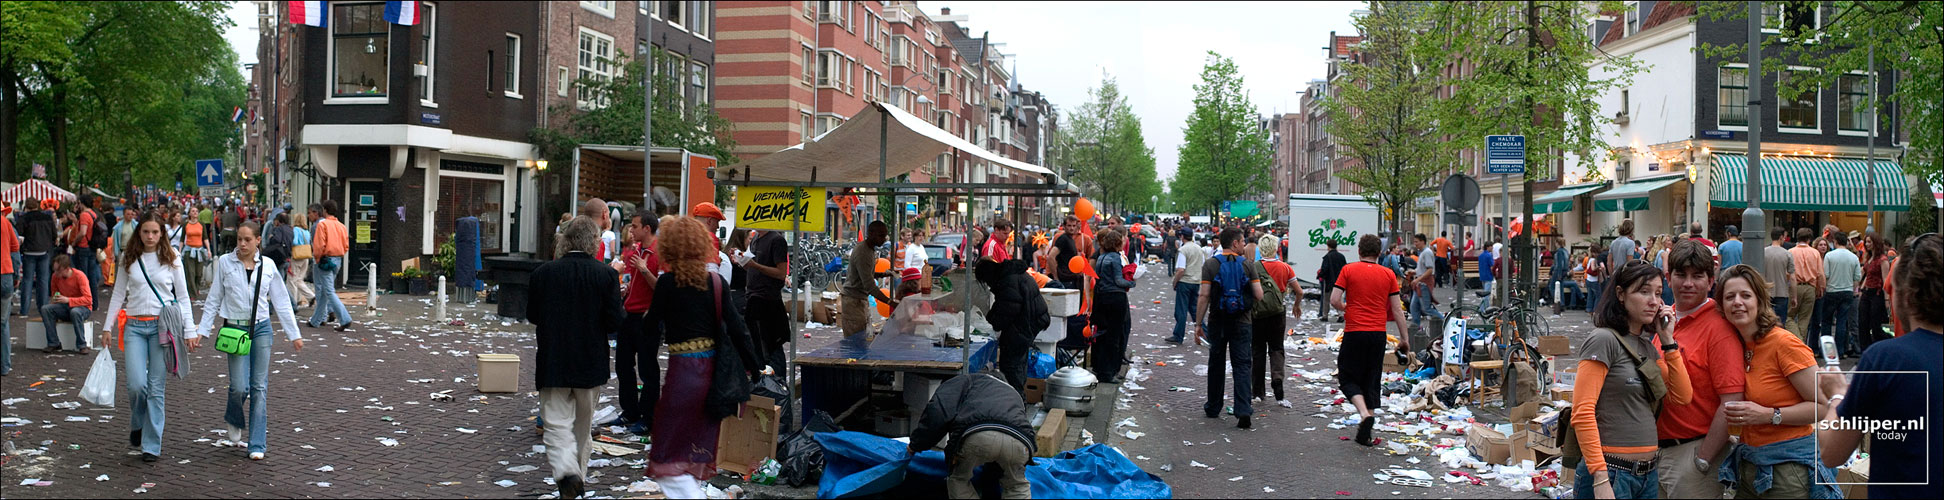 Nederland, Amsterdam, 30 april 2004